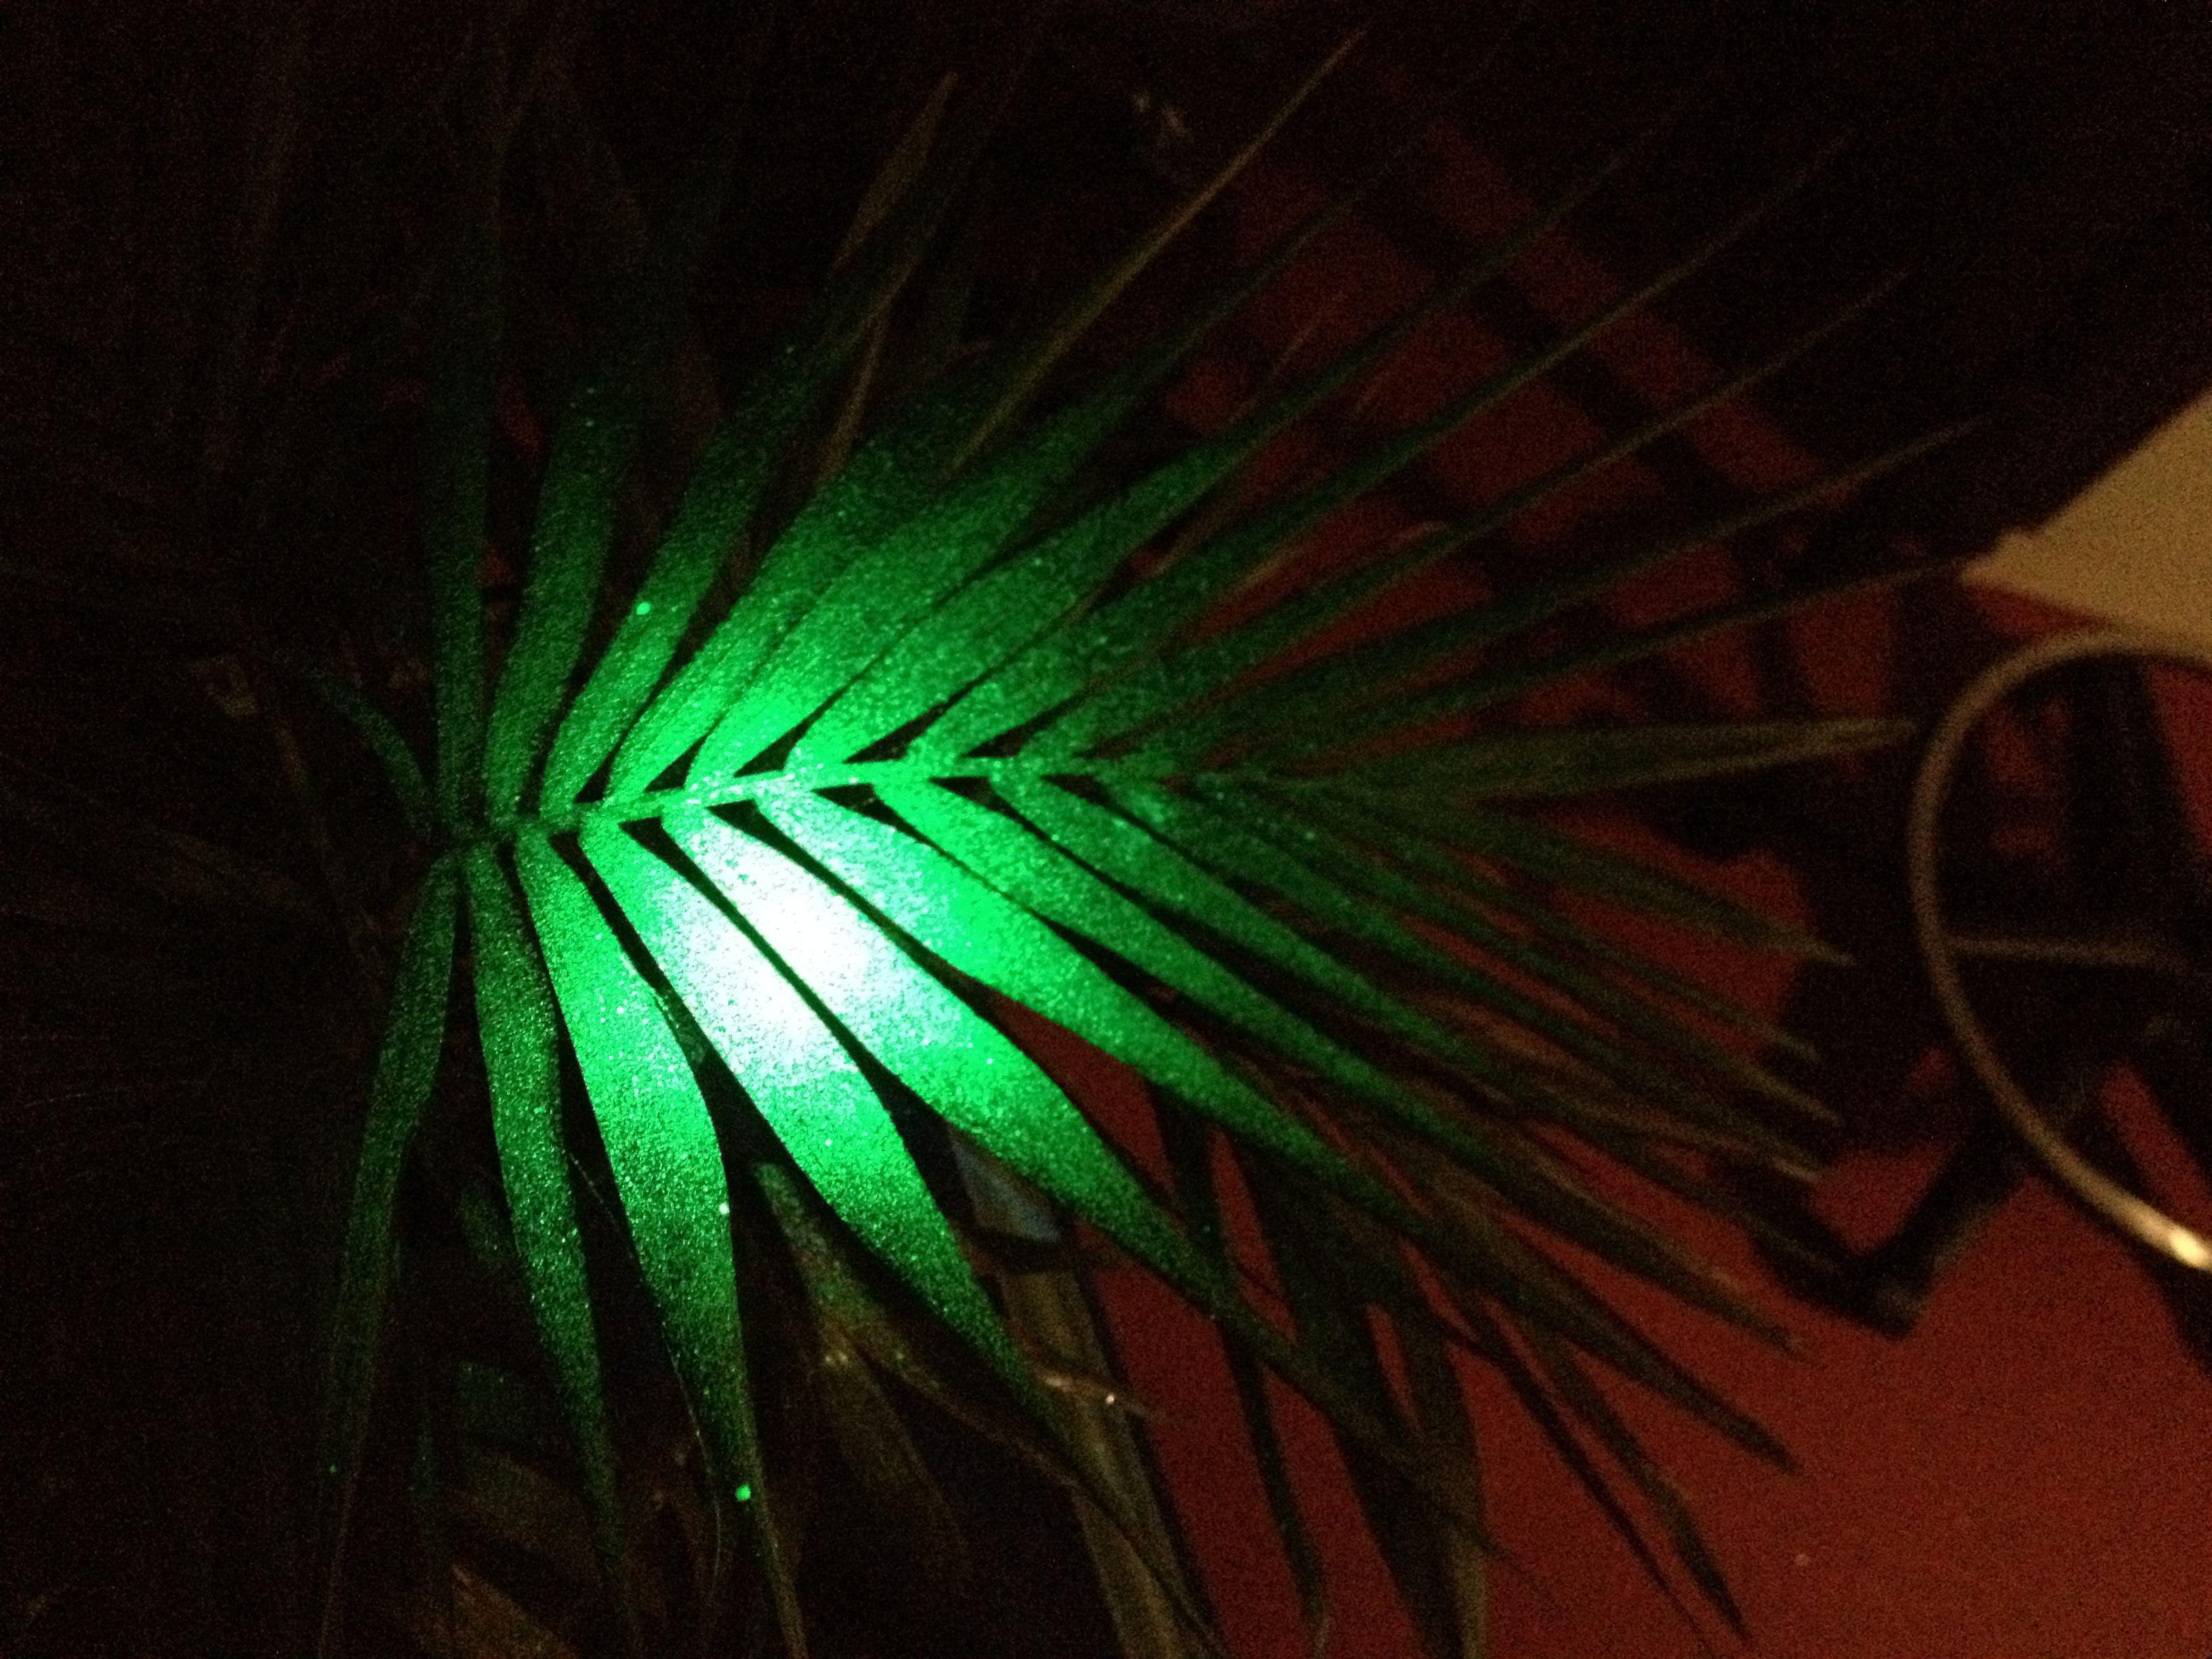 Galassia sprayed on live palm